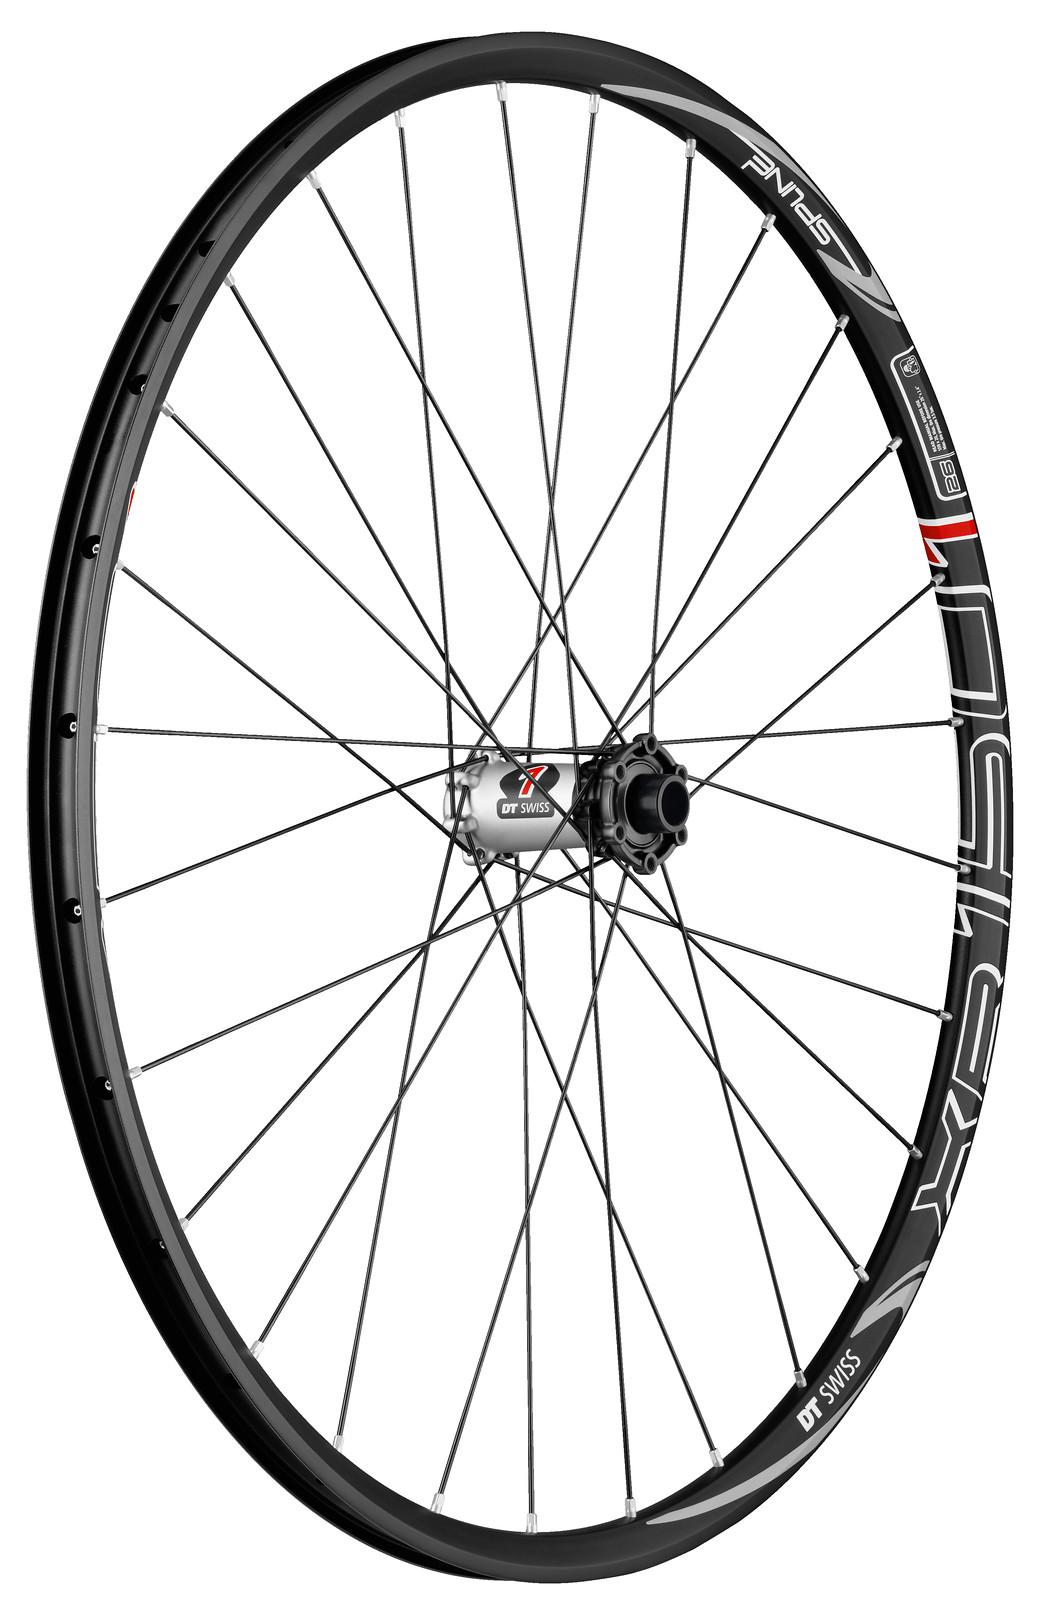 DT Swiss XR1501 Spline ONE 26 Wheelset PHO_XR_1501_SPLINE_ONE_26_BLACK_TA_15_100_FW_RGB